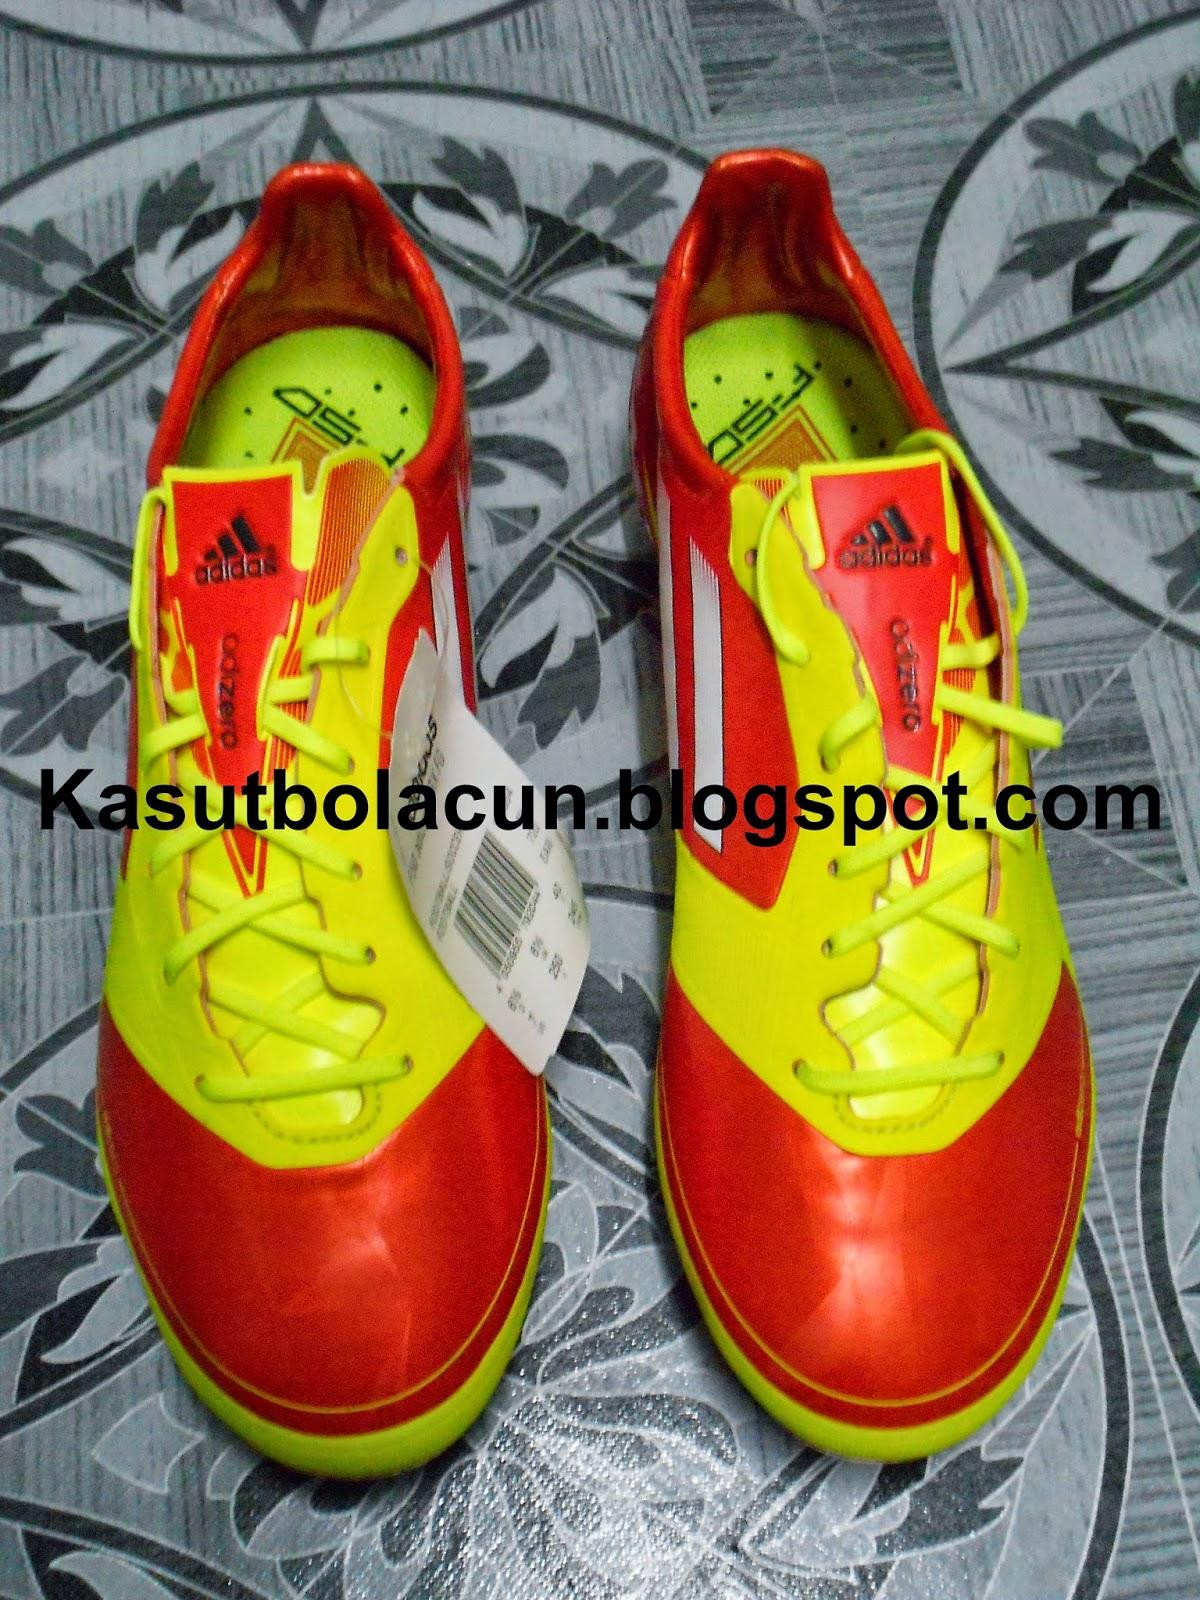 http://kasutbolacun.blogspot.com/2015/02/adidas-f50-adizero-micoach-1-fg-merah_1.html